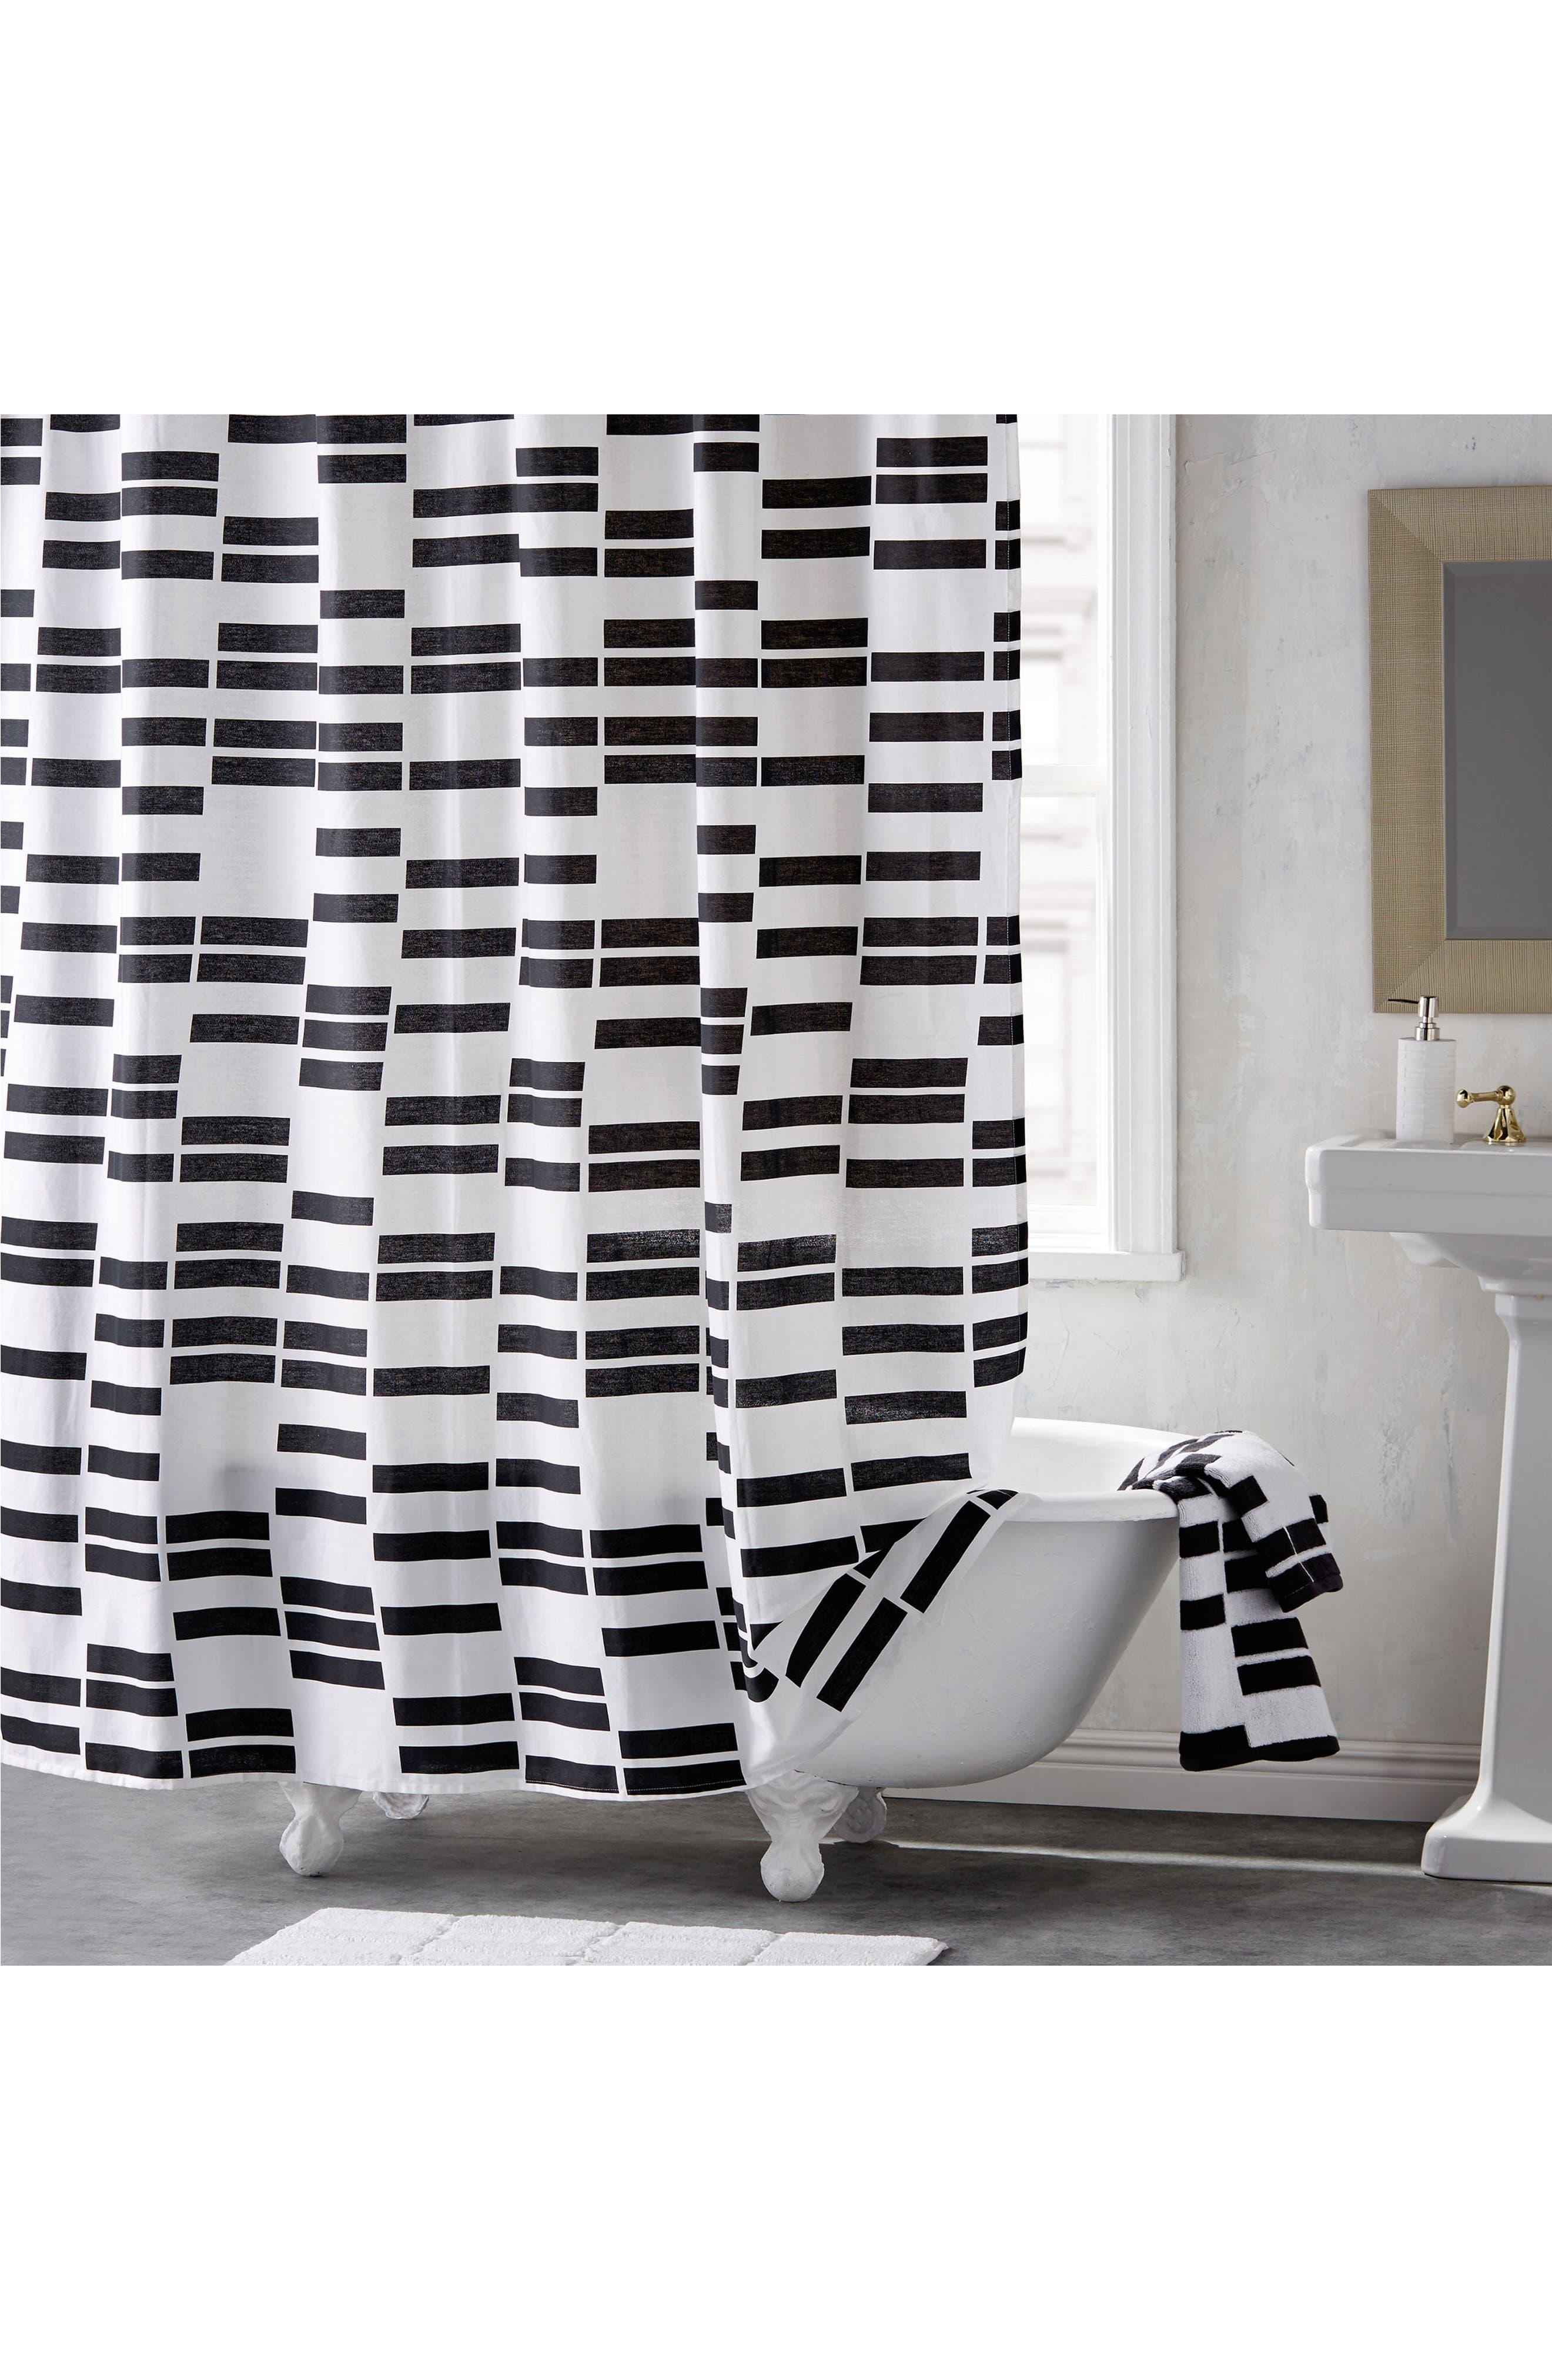 DKNY High Rise Shower Curtain